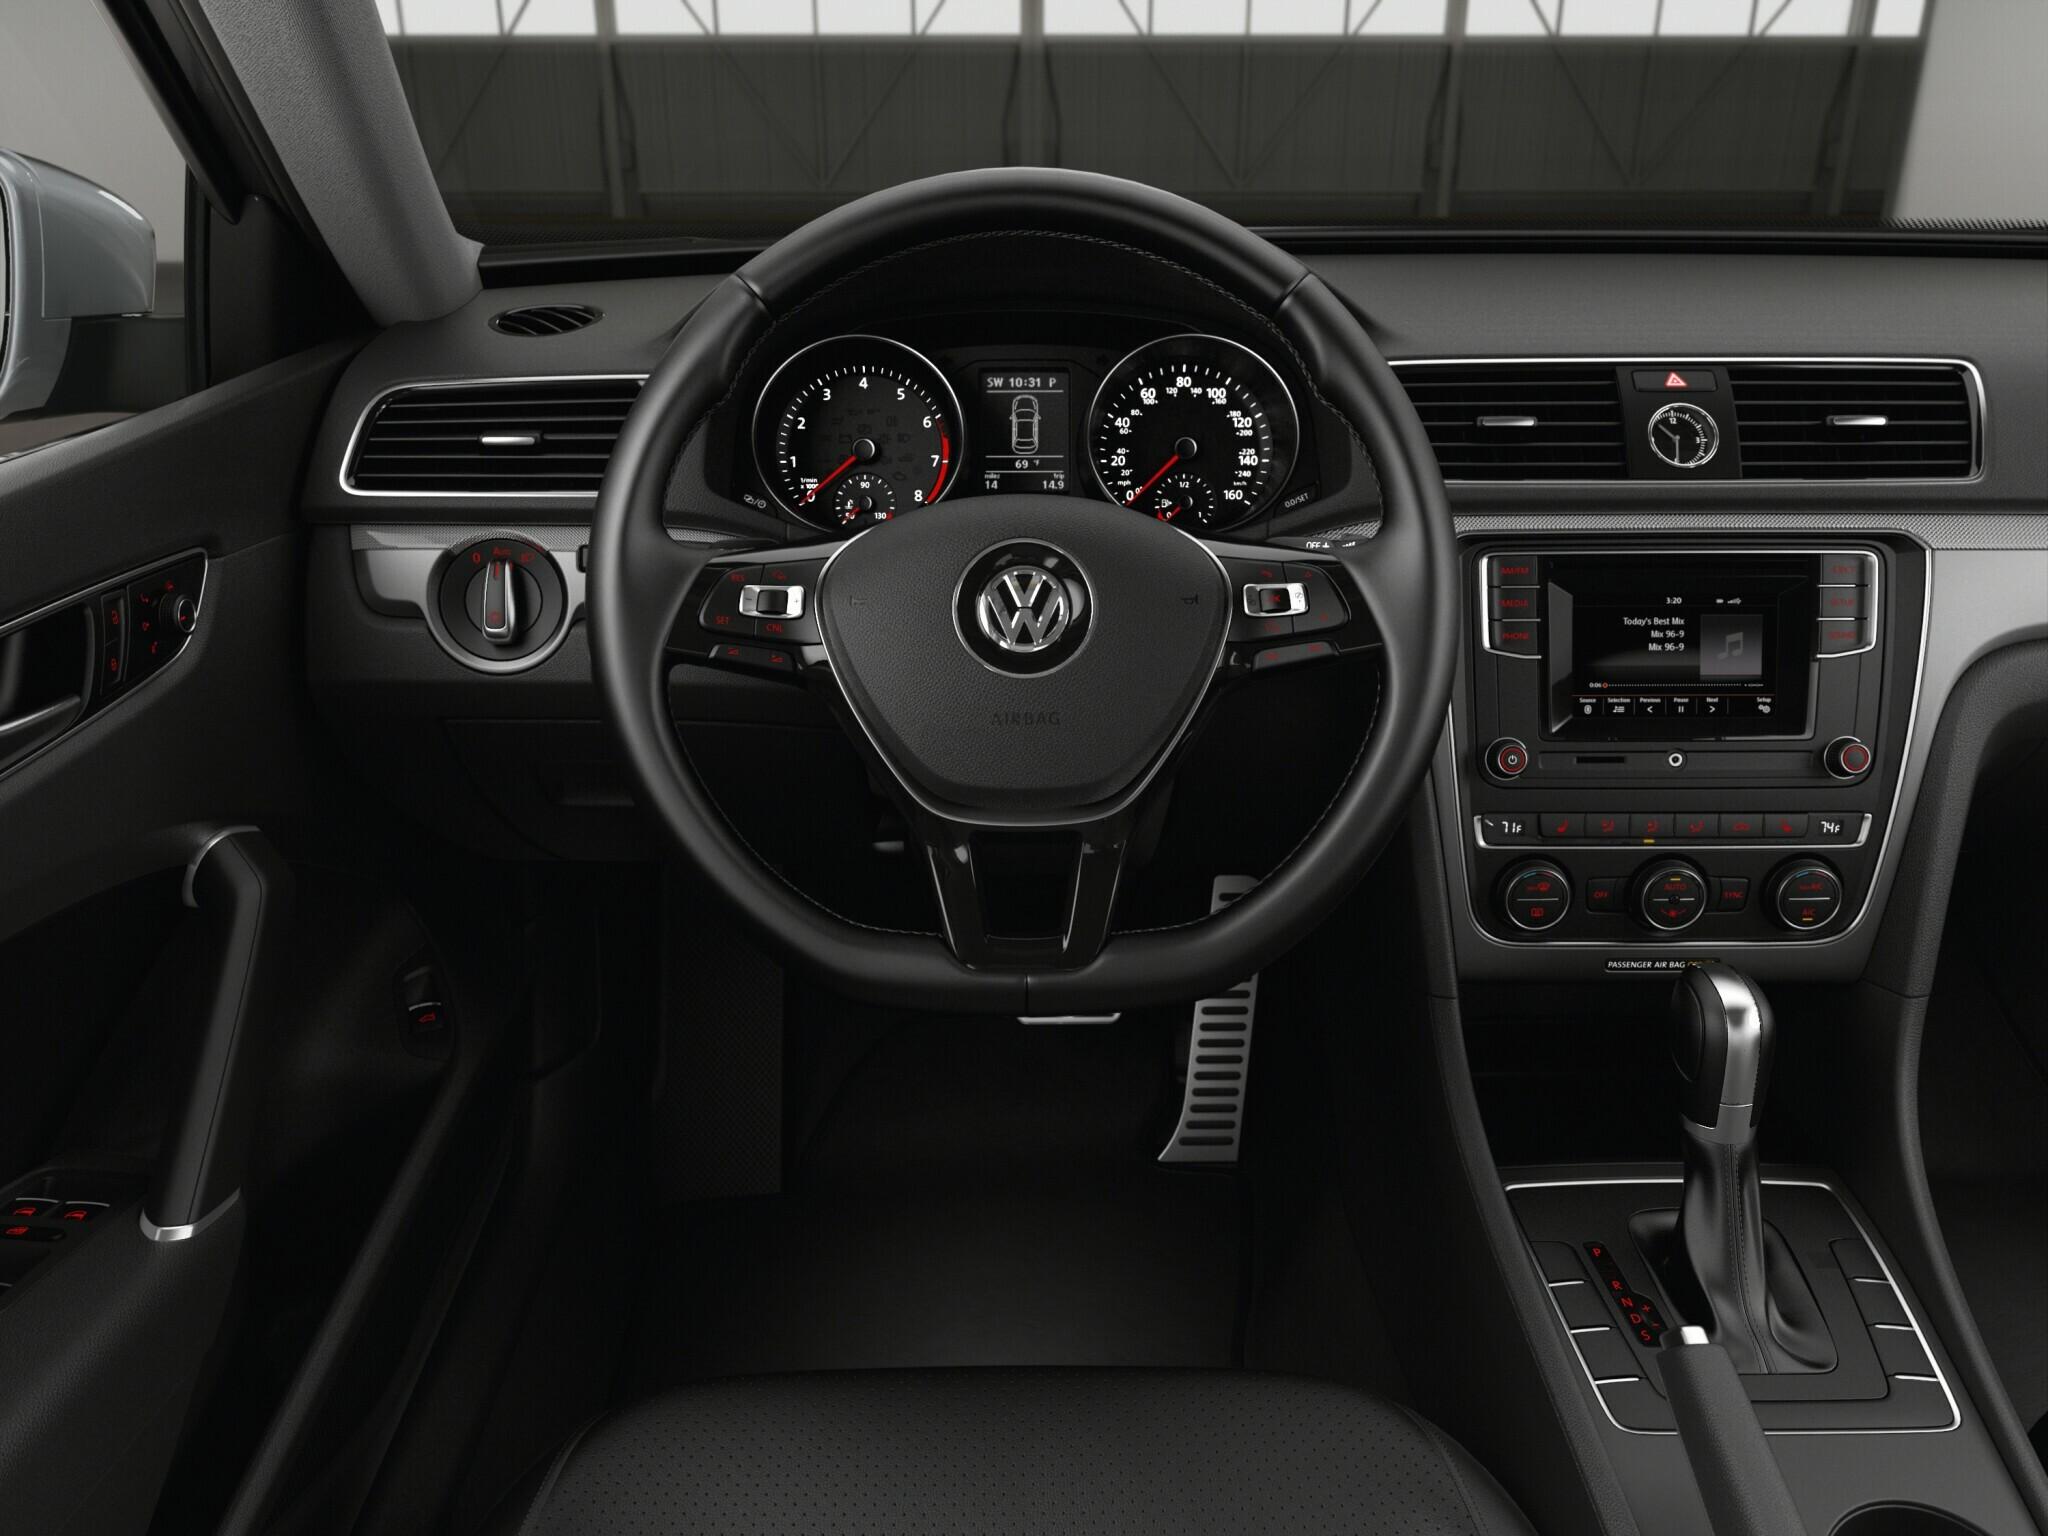 2017 volkswagen passat interior lights. Black Bedroom Furniture Sets. Home Design Ideas